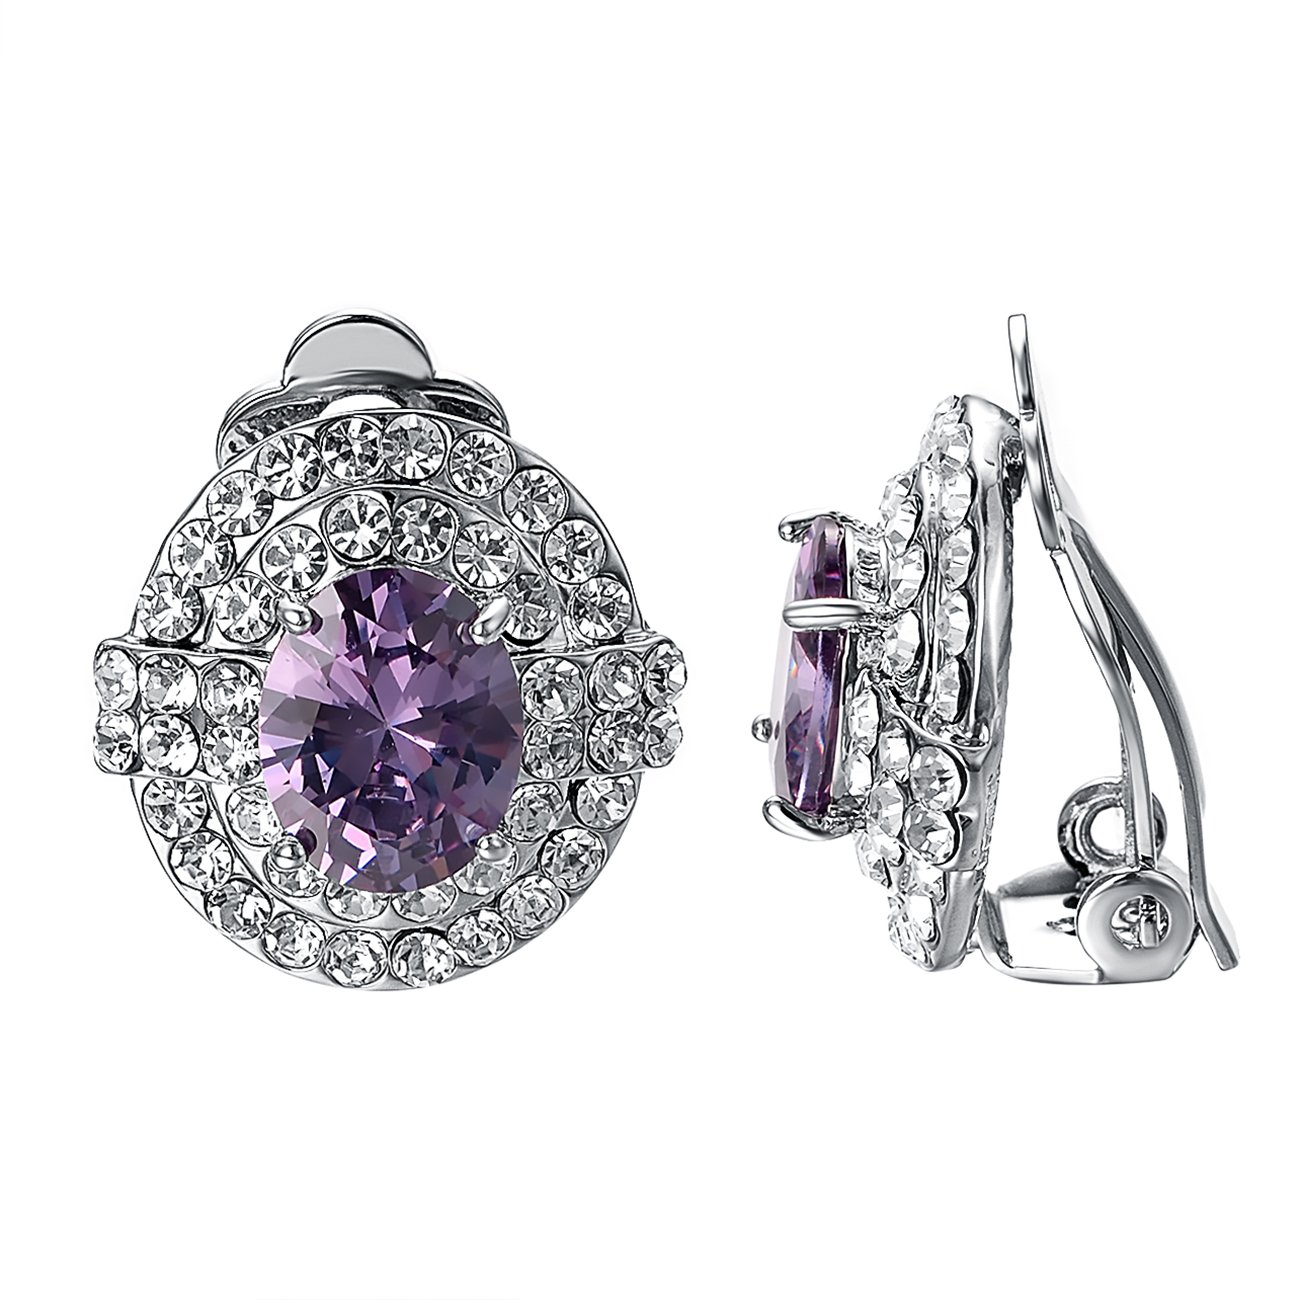 Yoursfs Large Clip-On Earrings for Wedding Bridal Rhinestone Opal Oval Shape Non Pierced Ears Clips (Clip On Earrings)